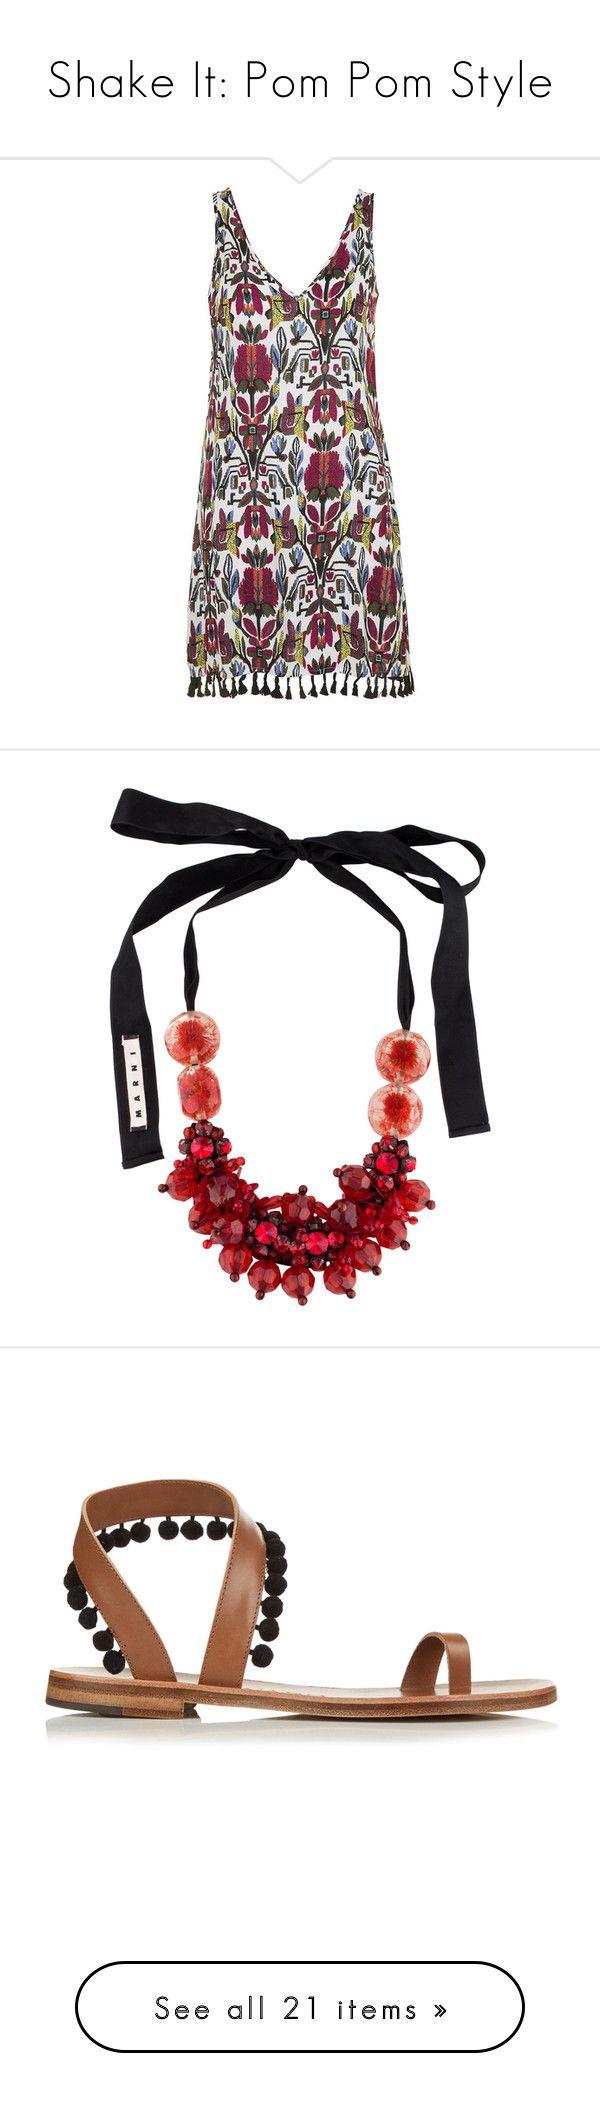 """Shake It: Pom Pom Style"" by polyvore-editorial ❤ liked on Polyvore featuring PomPoms, dresses, multi, pom pom dress, topshop, v neck dress, plunge dress, plunging v neck dress, jewelry and necklaces"